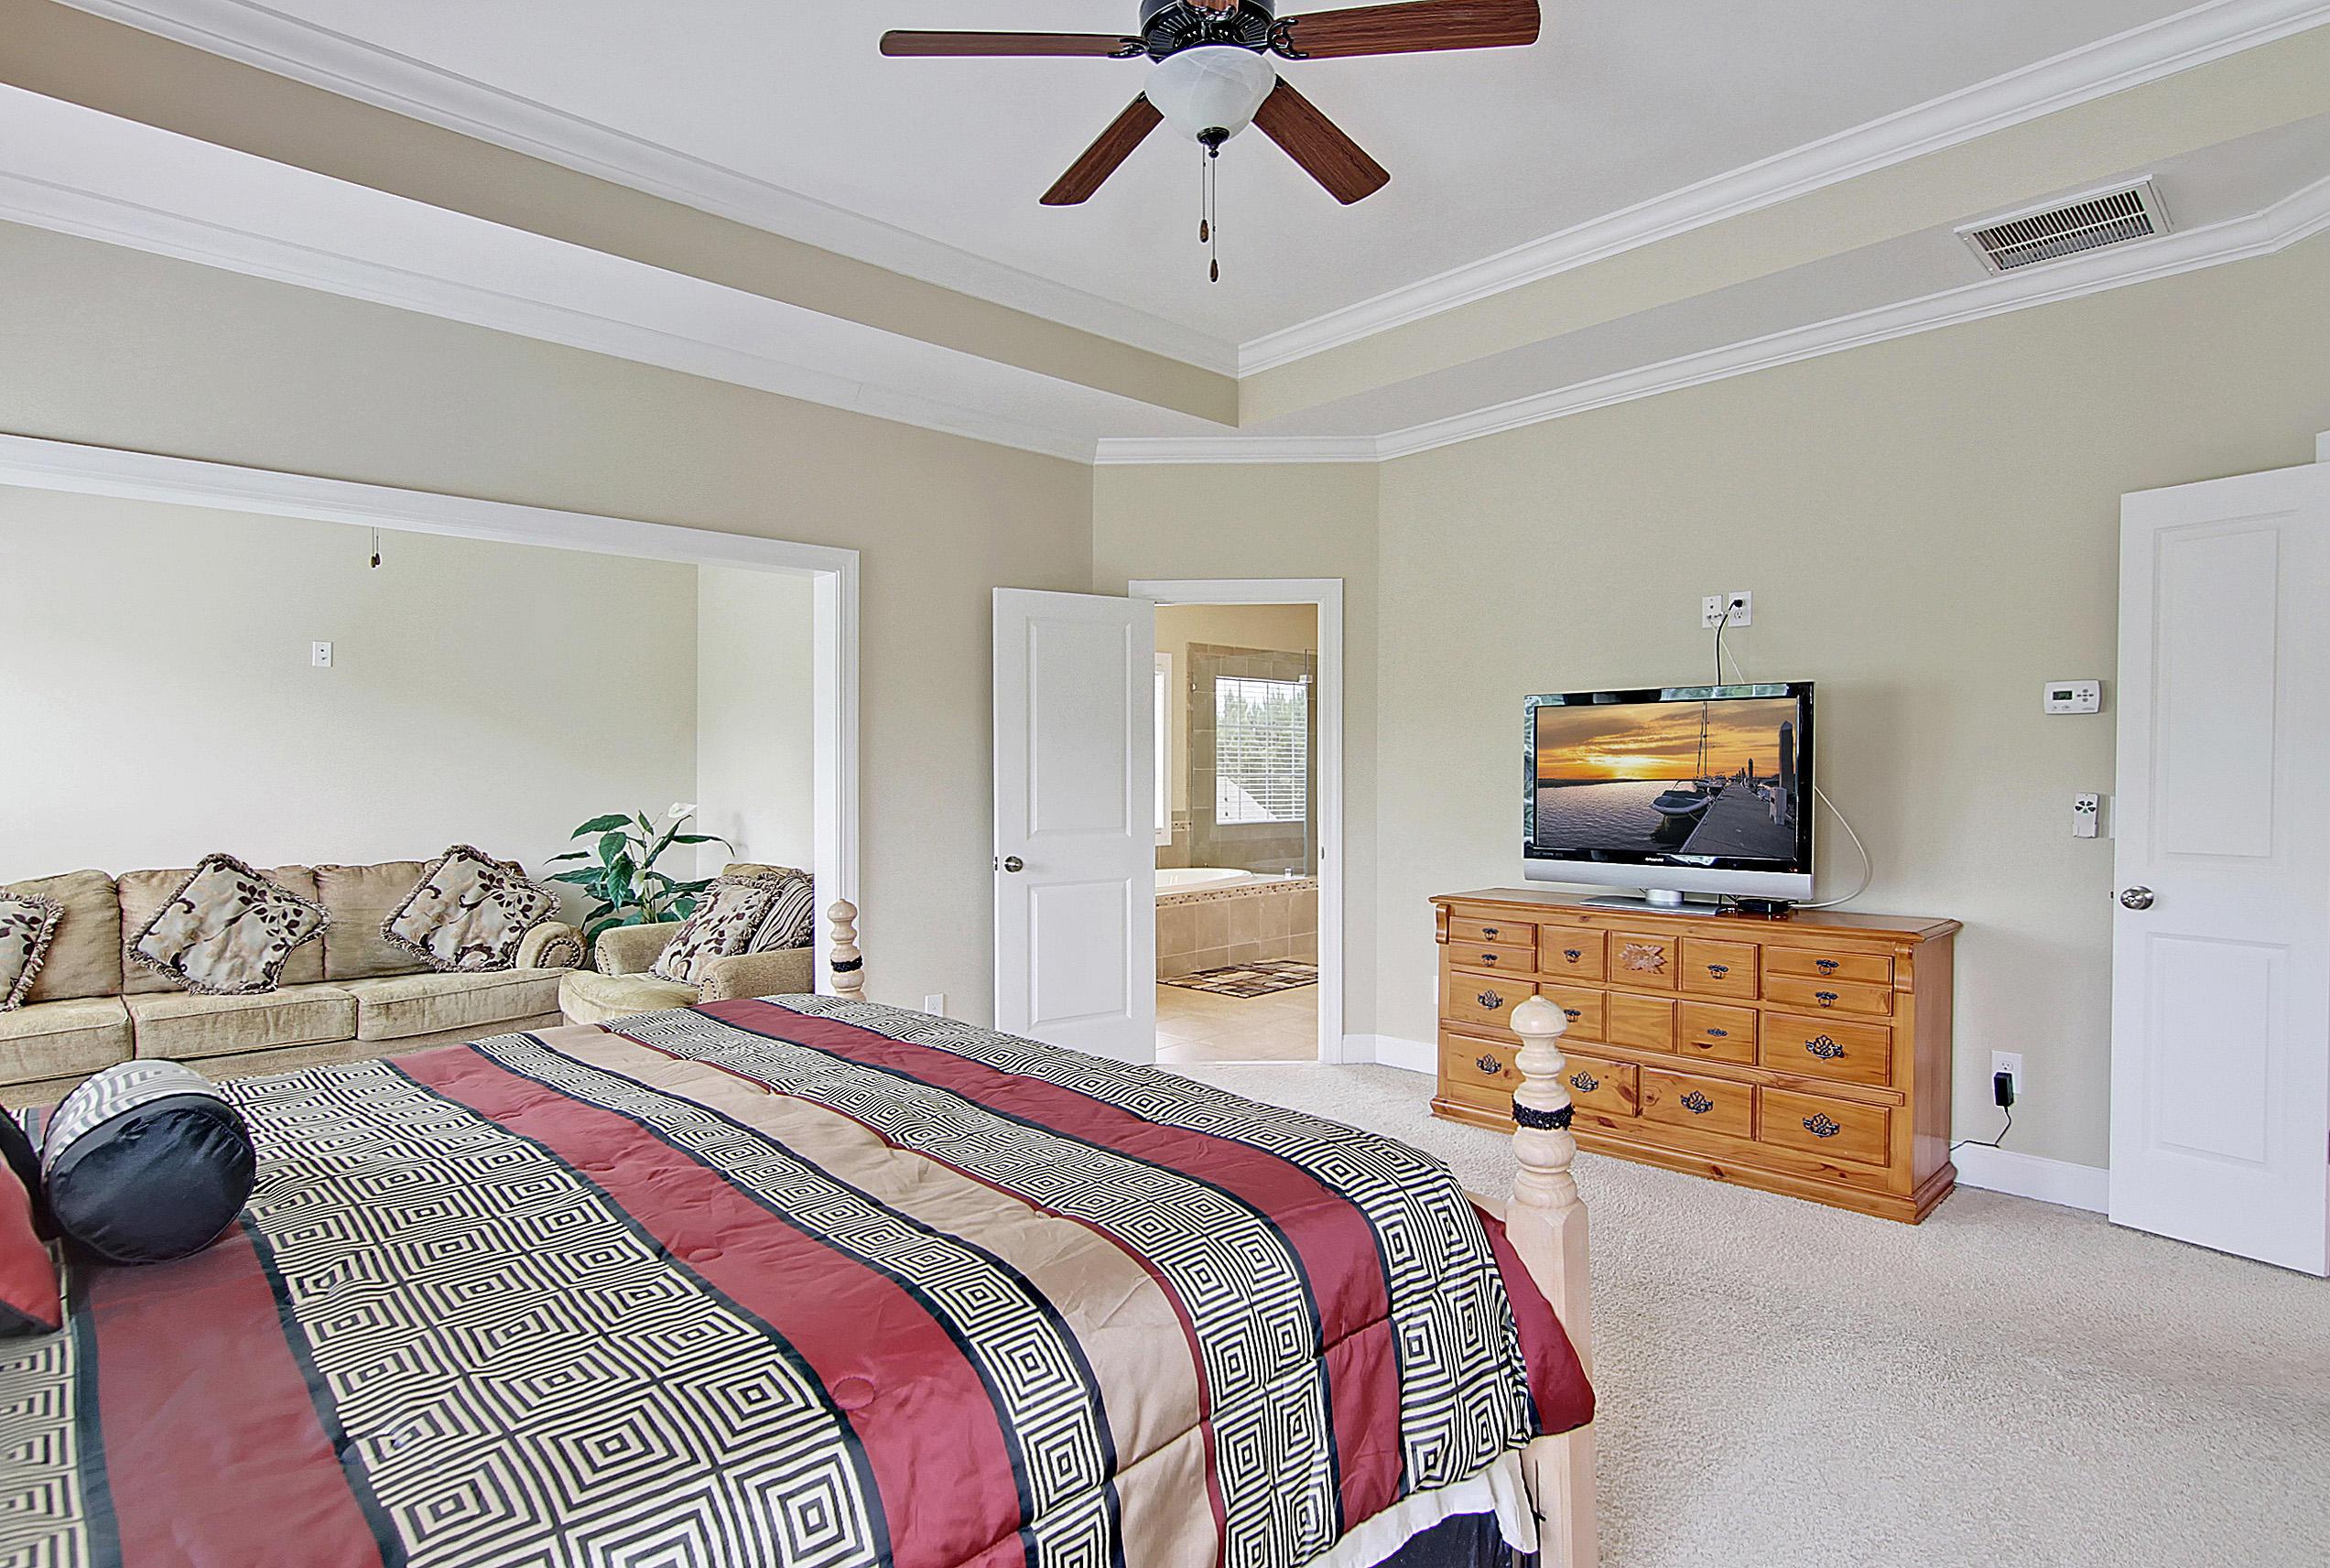 Dunes West Homes For Sale - 1332 Whisker Pole, Mount Pleasant, SC - 2